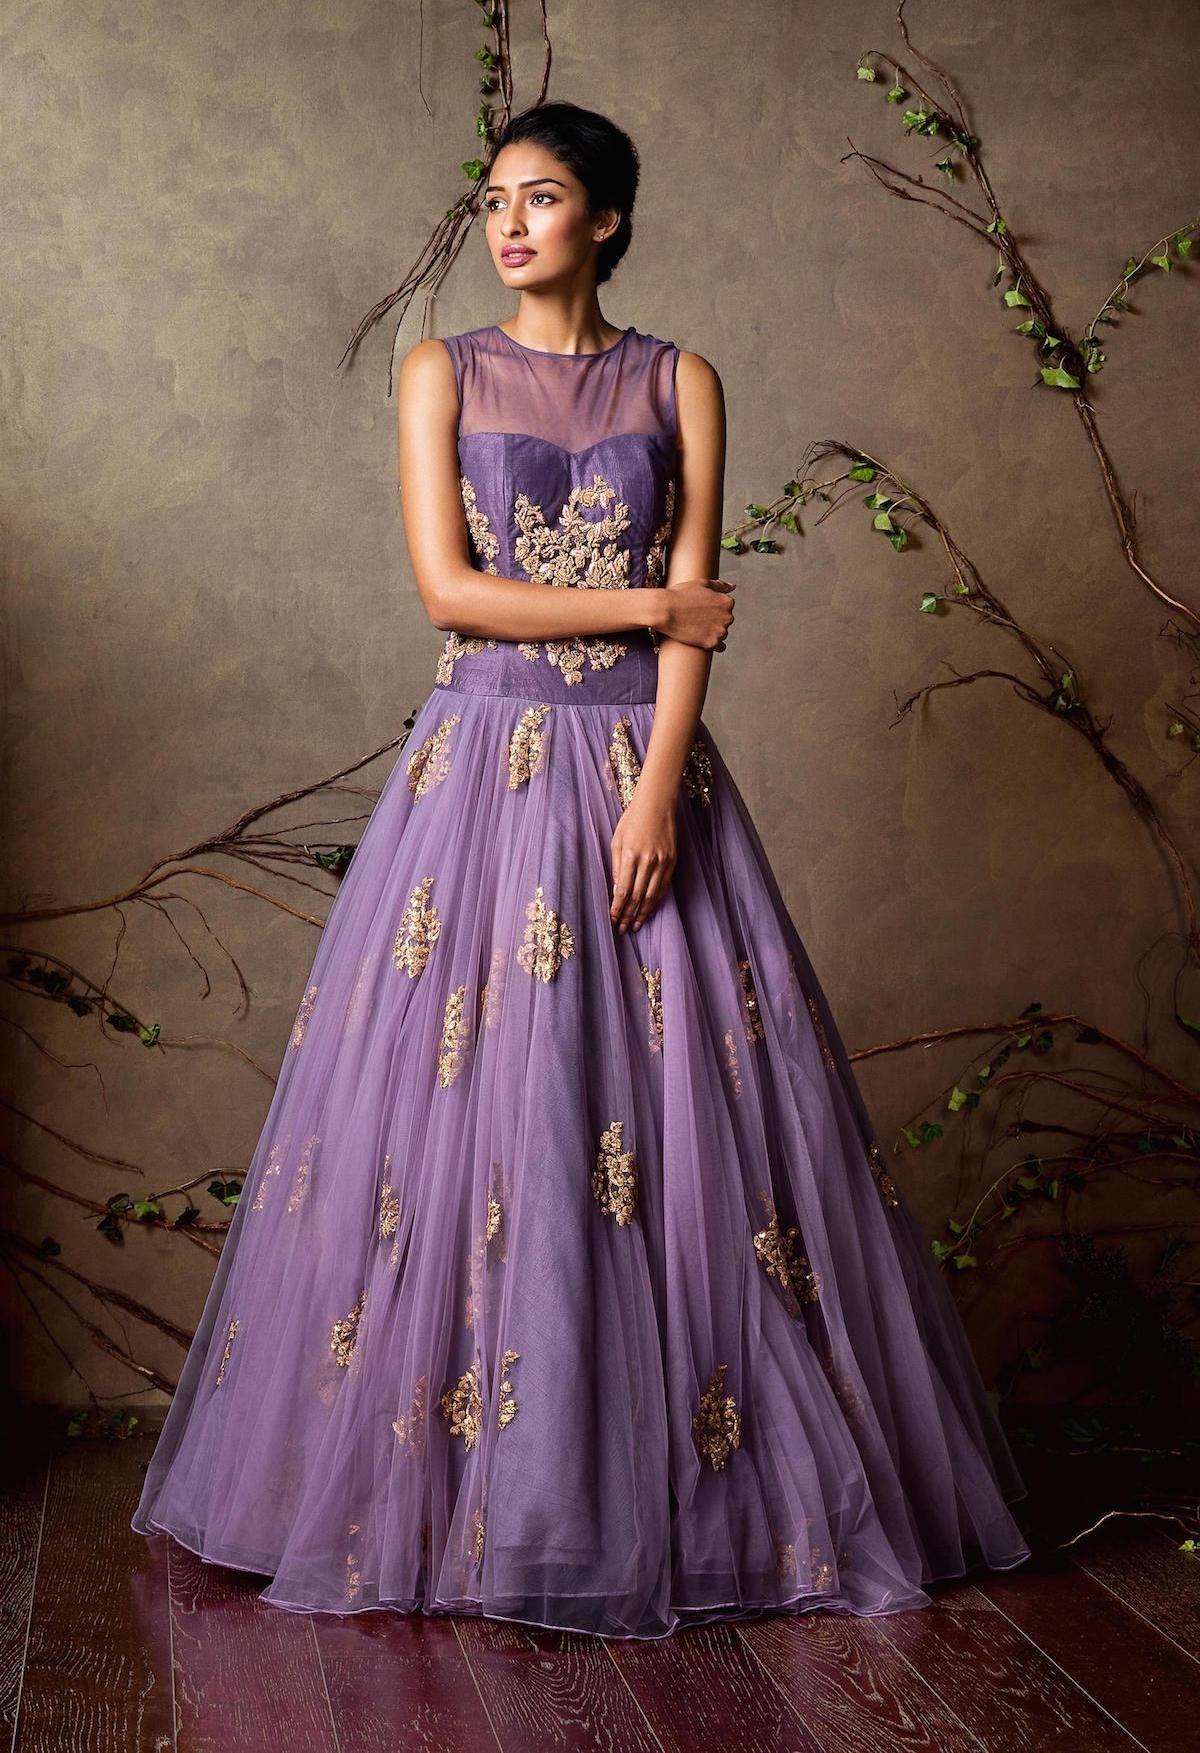 Pin de Anjulee Patel Bakshi en wedding/reception outfits | Pinterest